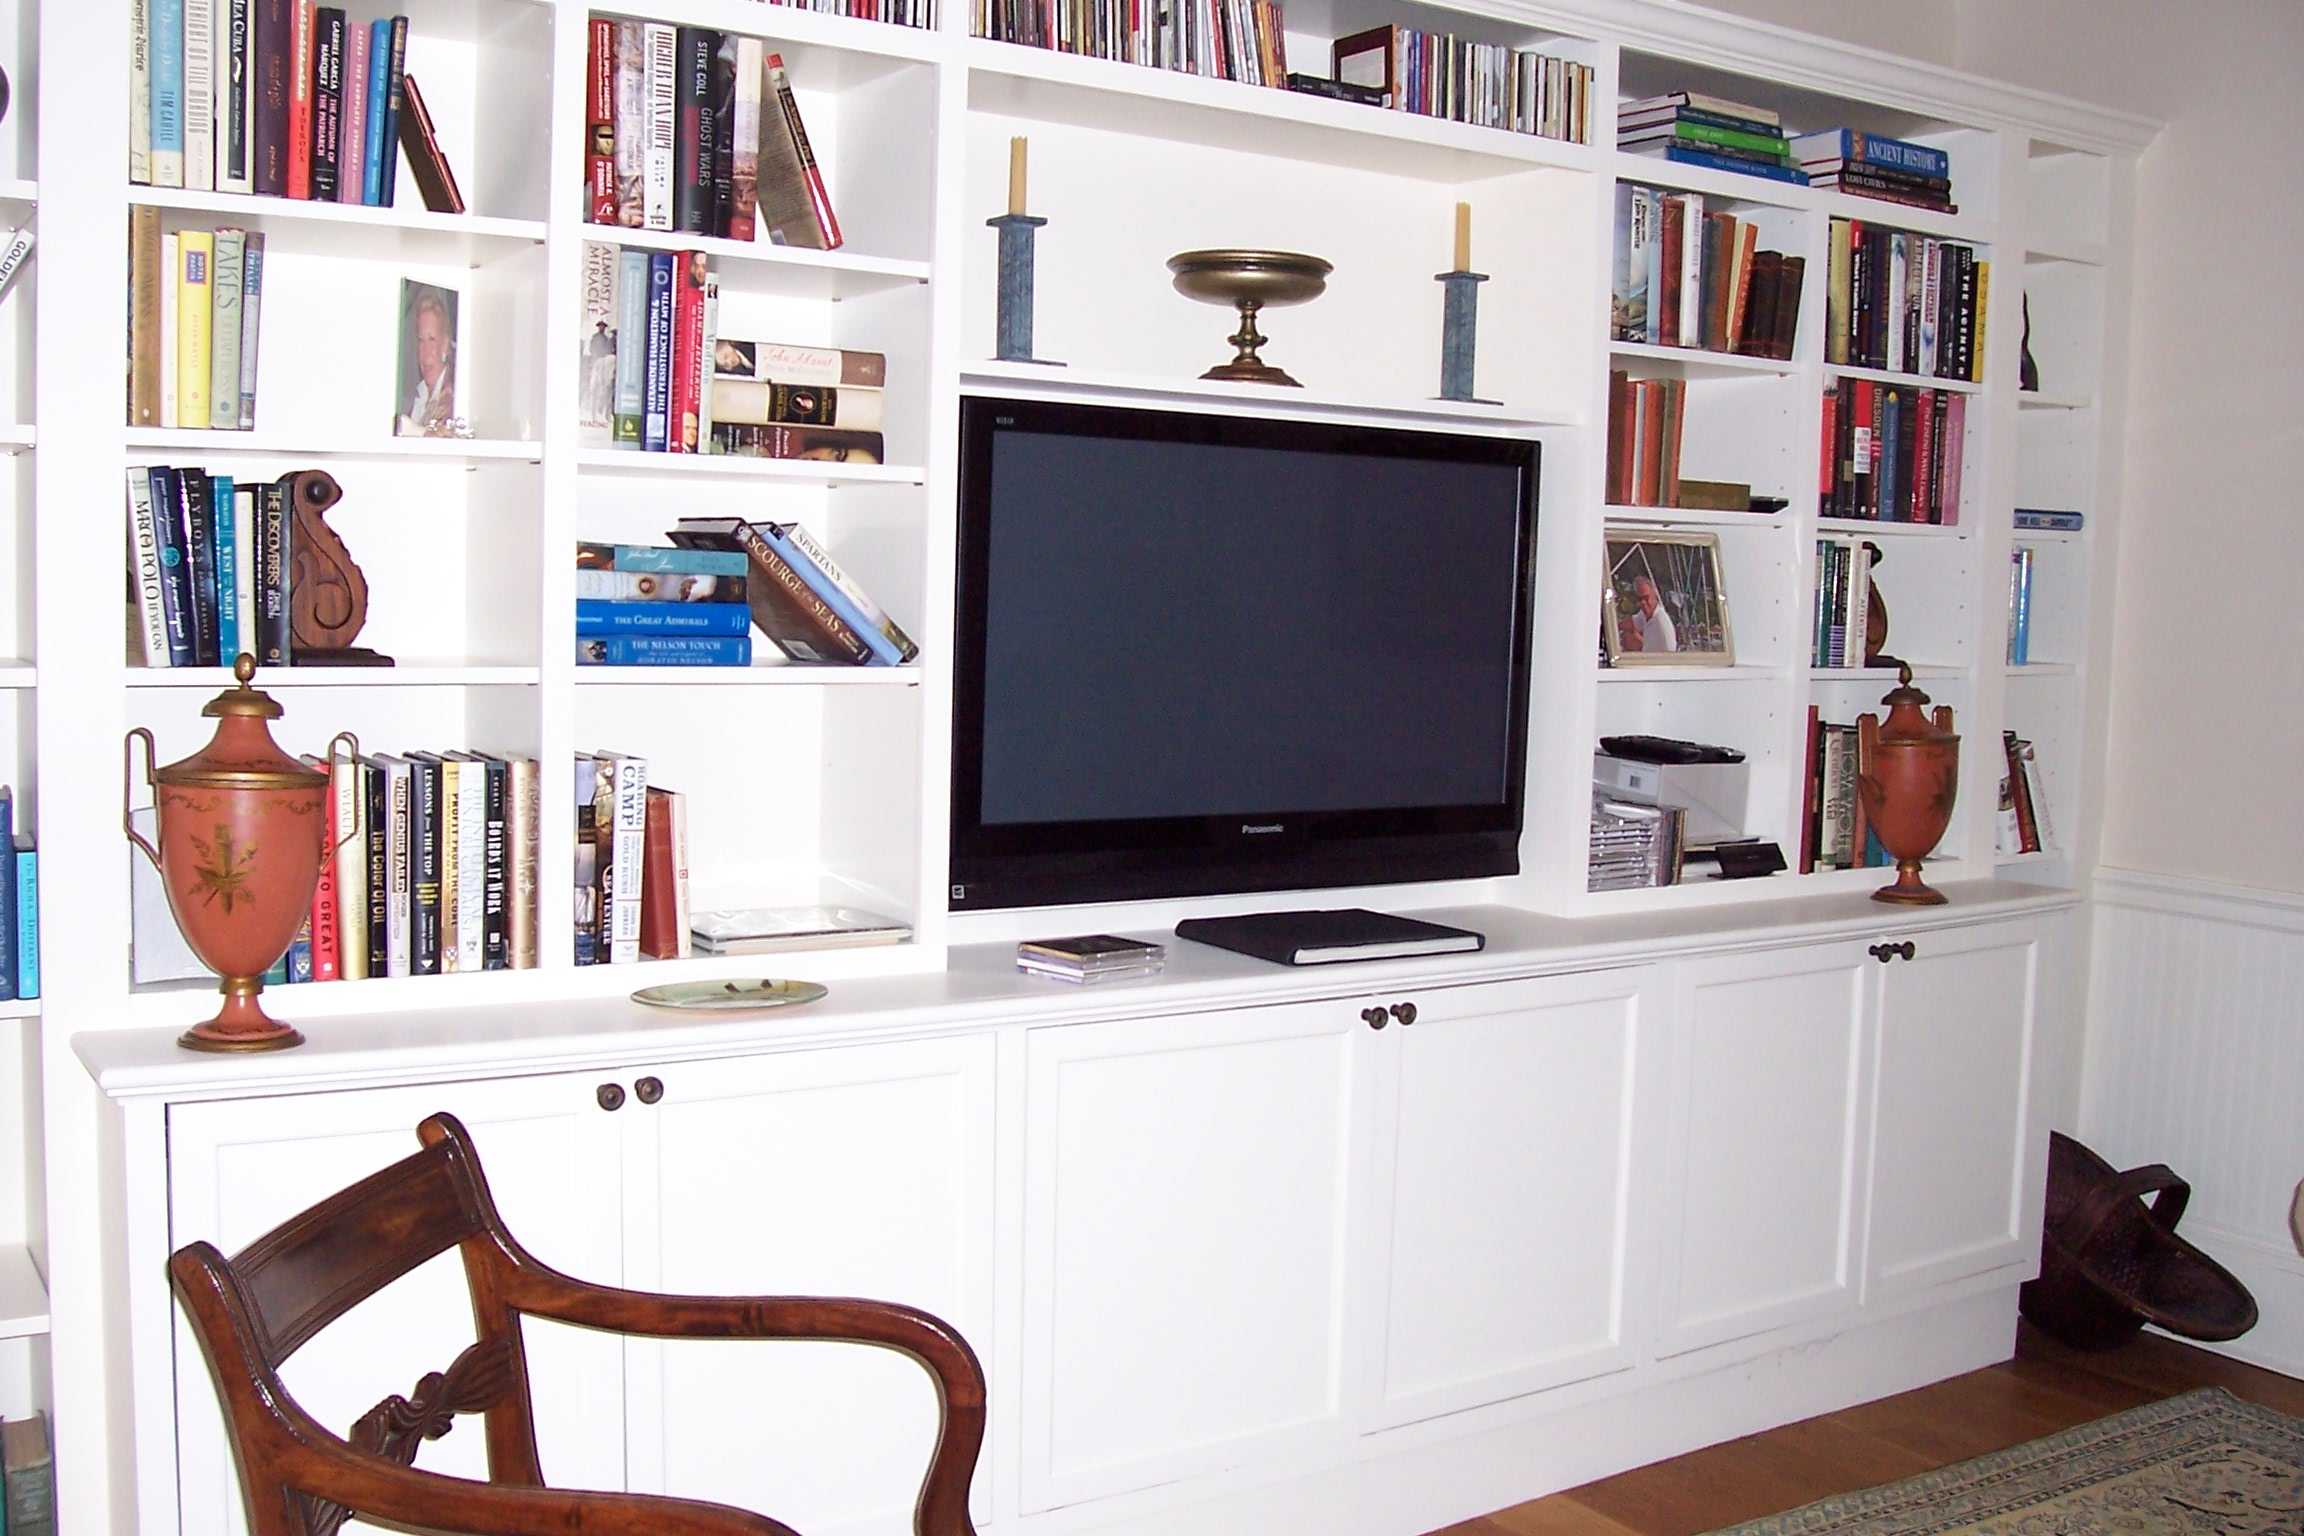 dennis-schorndorf-wall-media-unit-bookcase